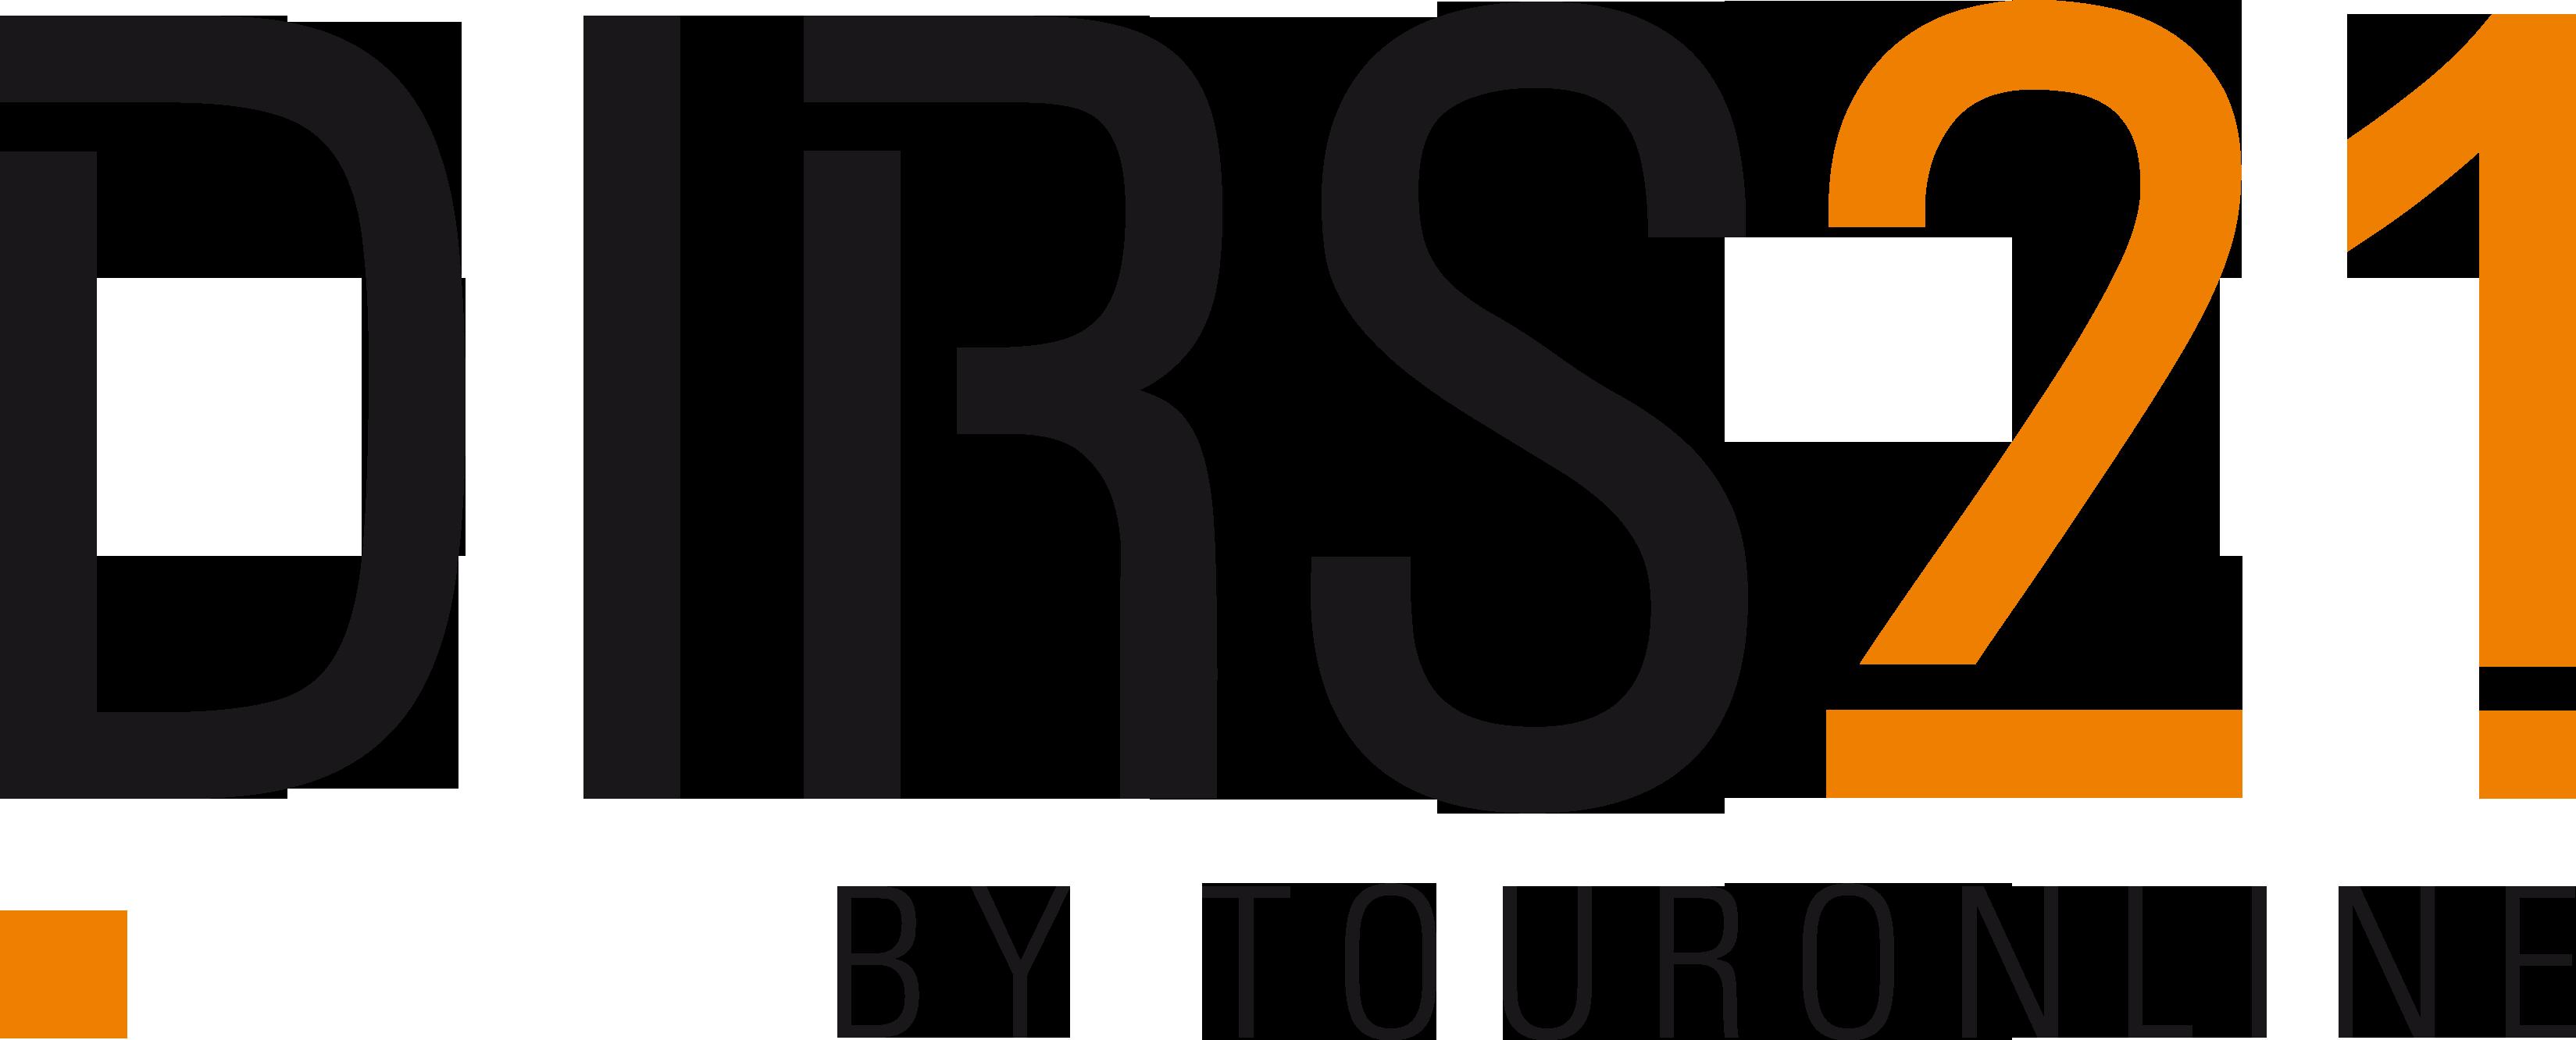 TourOnline (DIRS21)